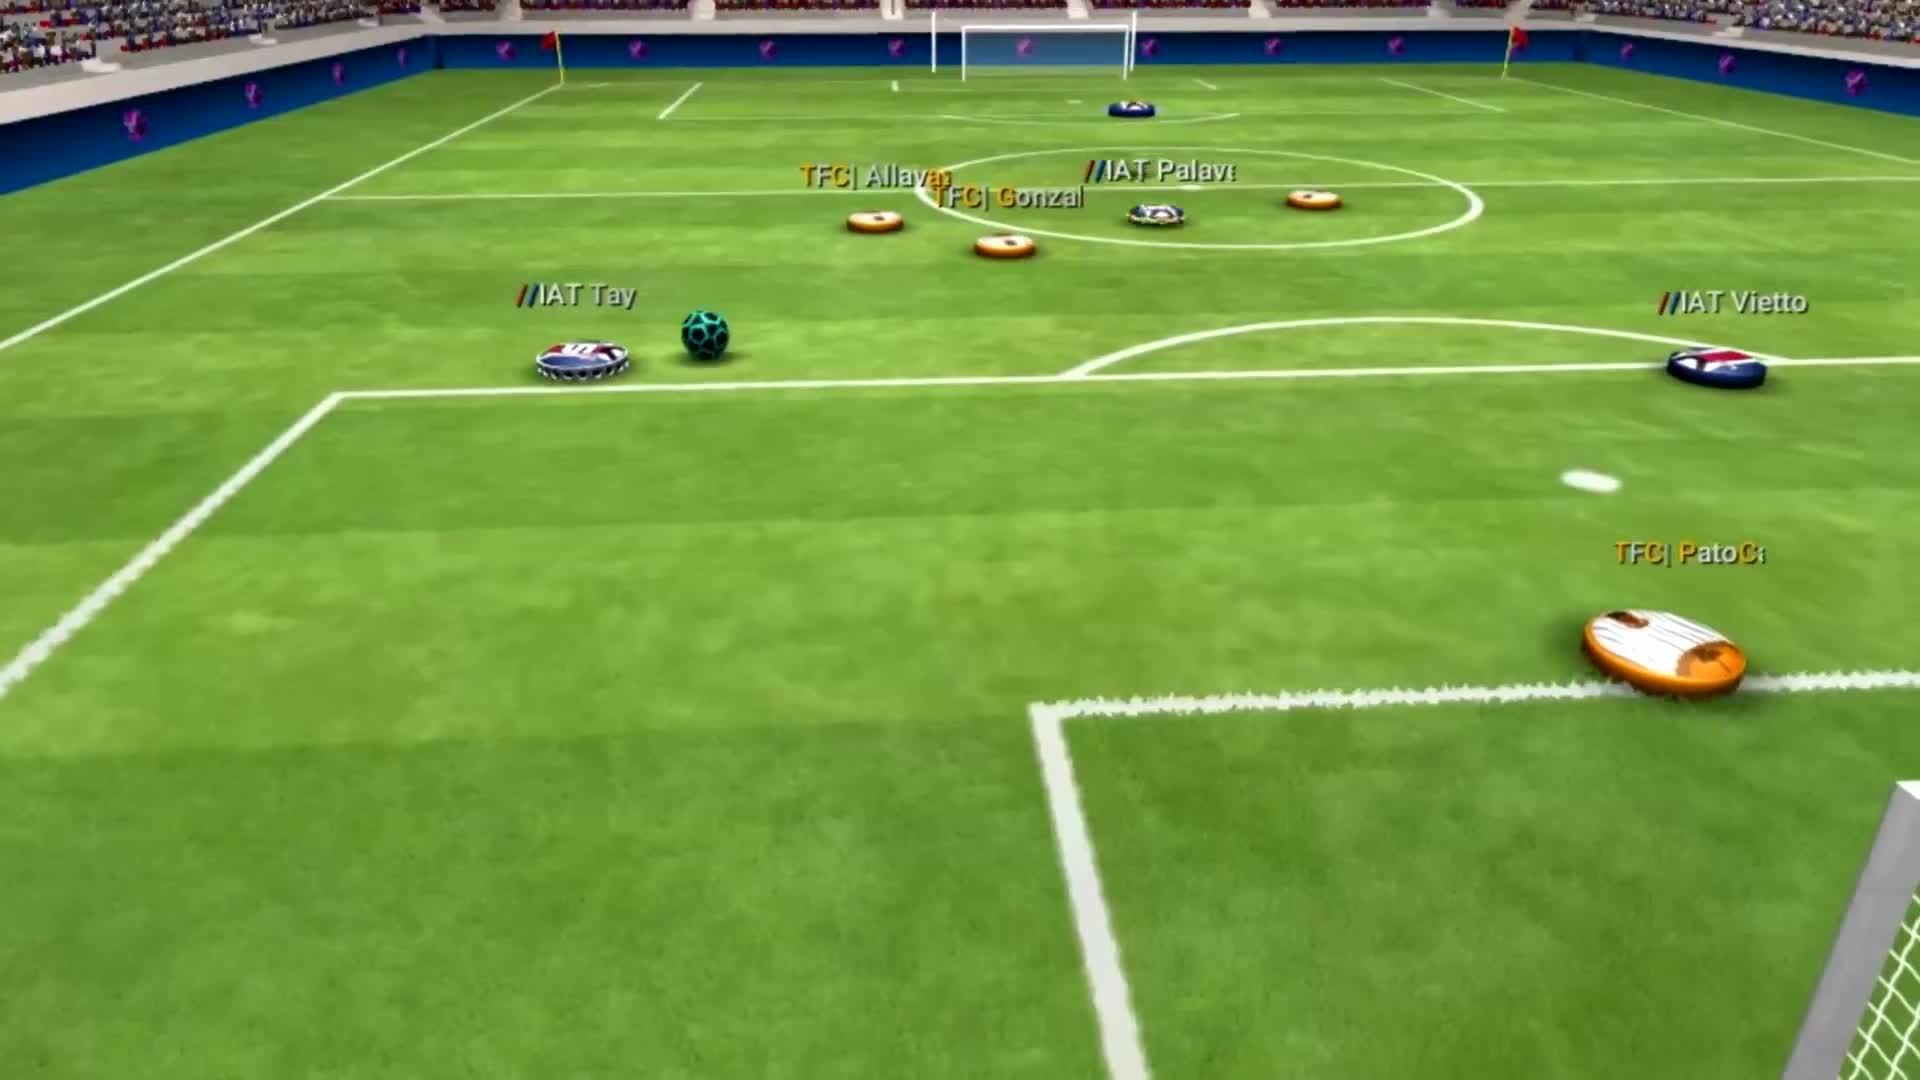 Ball 3D, Toronto FC, fifa, soccer, tfc, para la seleccion patocachalotes GIFs